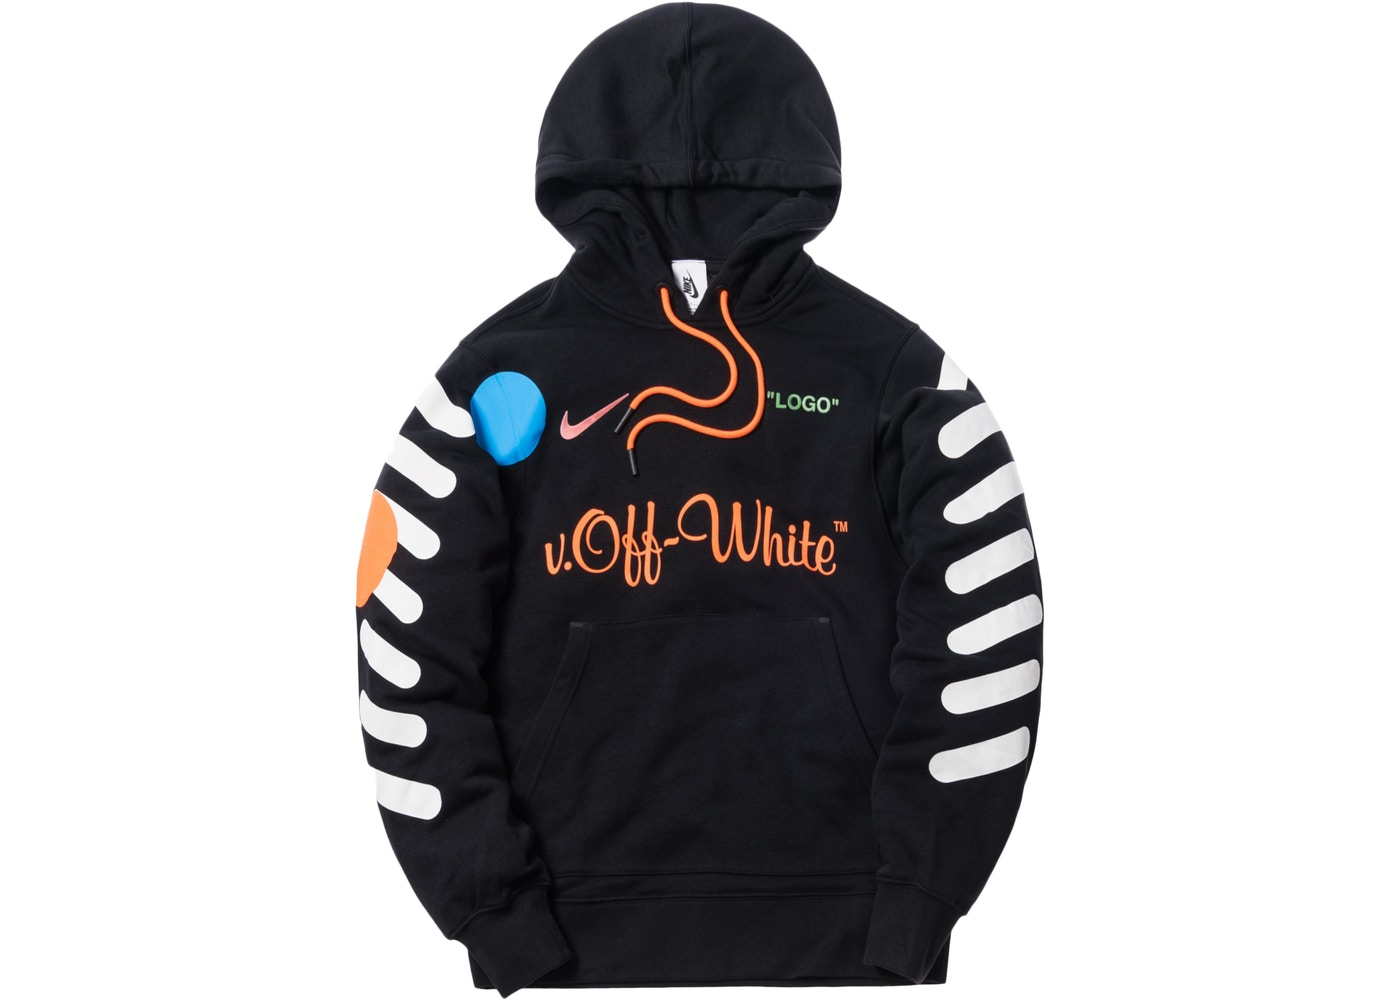 719c1c06 Streetwear - Featured